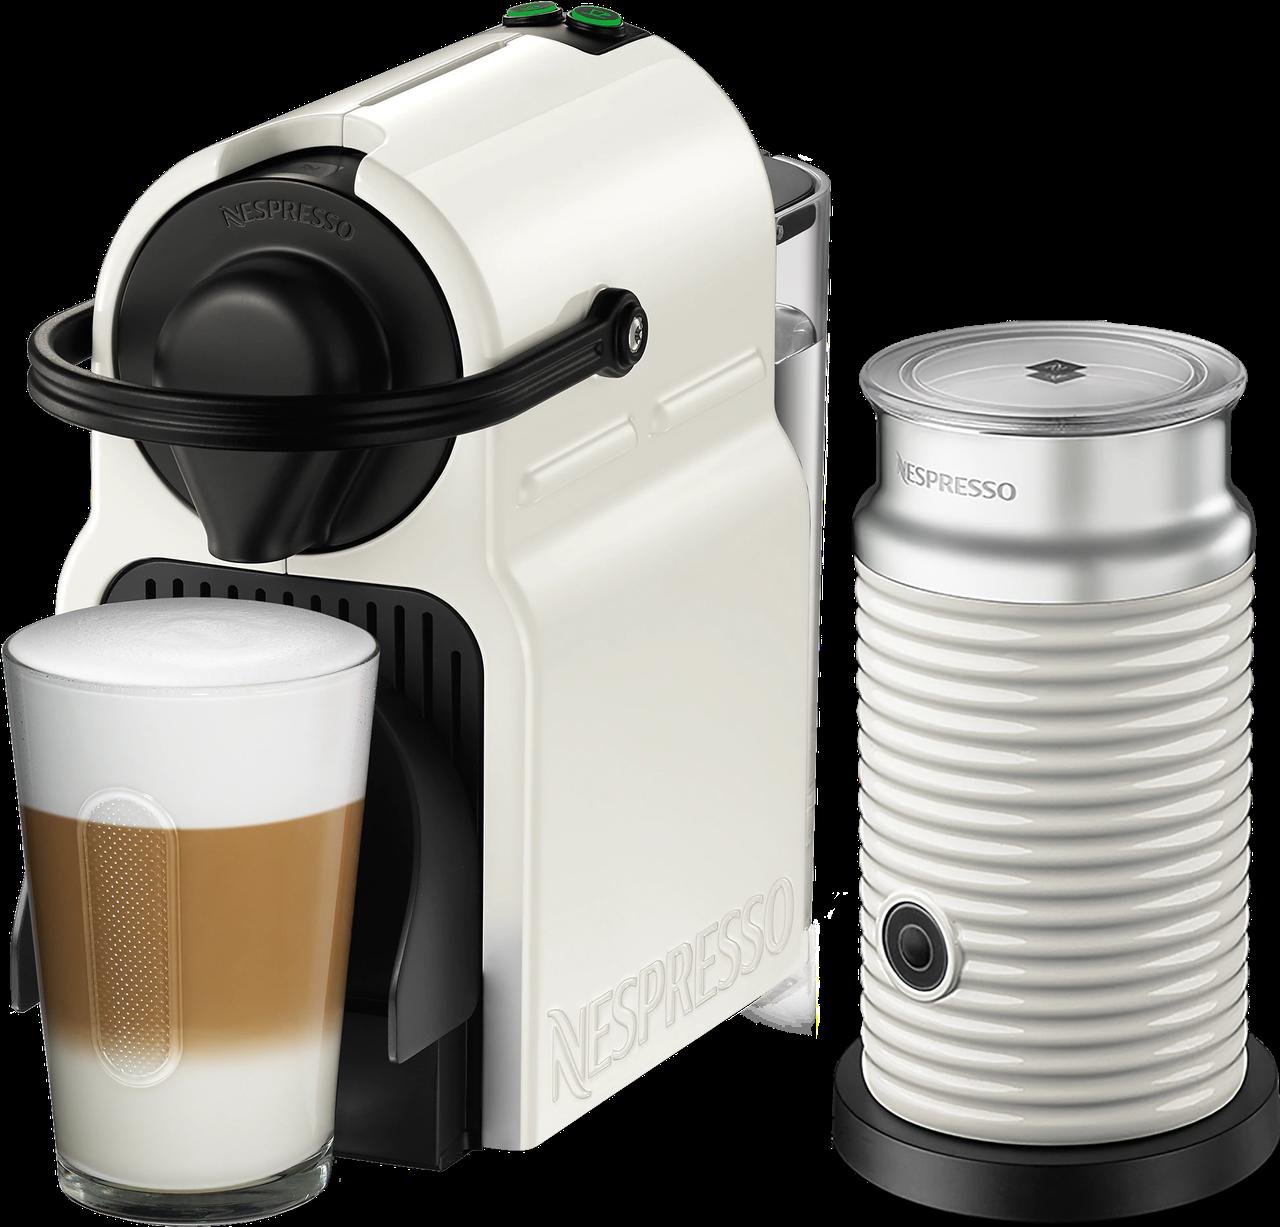 Кофемашина Nespresso Inissia White D40 & Aeroccino 3 White + доставка бесплат+дегустационный набор (14 капсул)